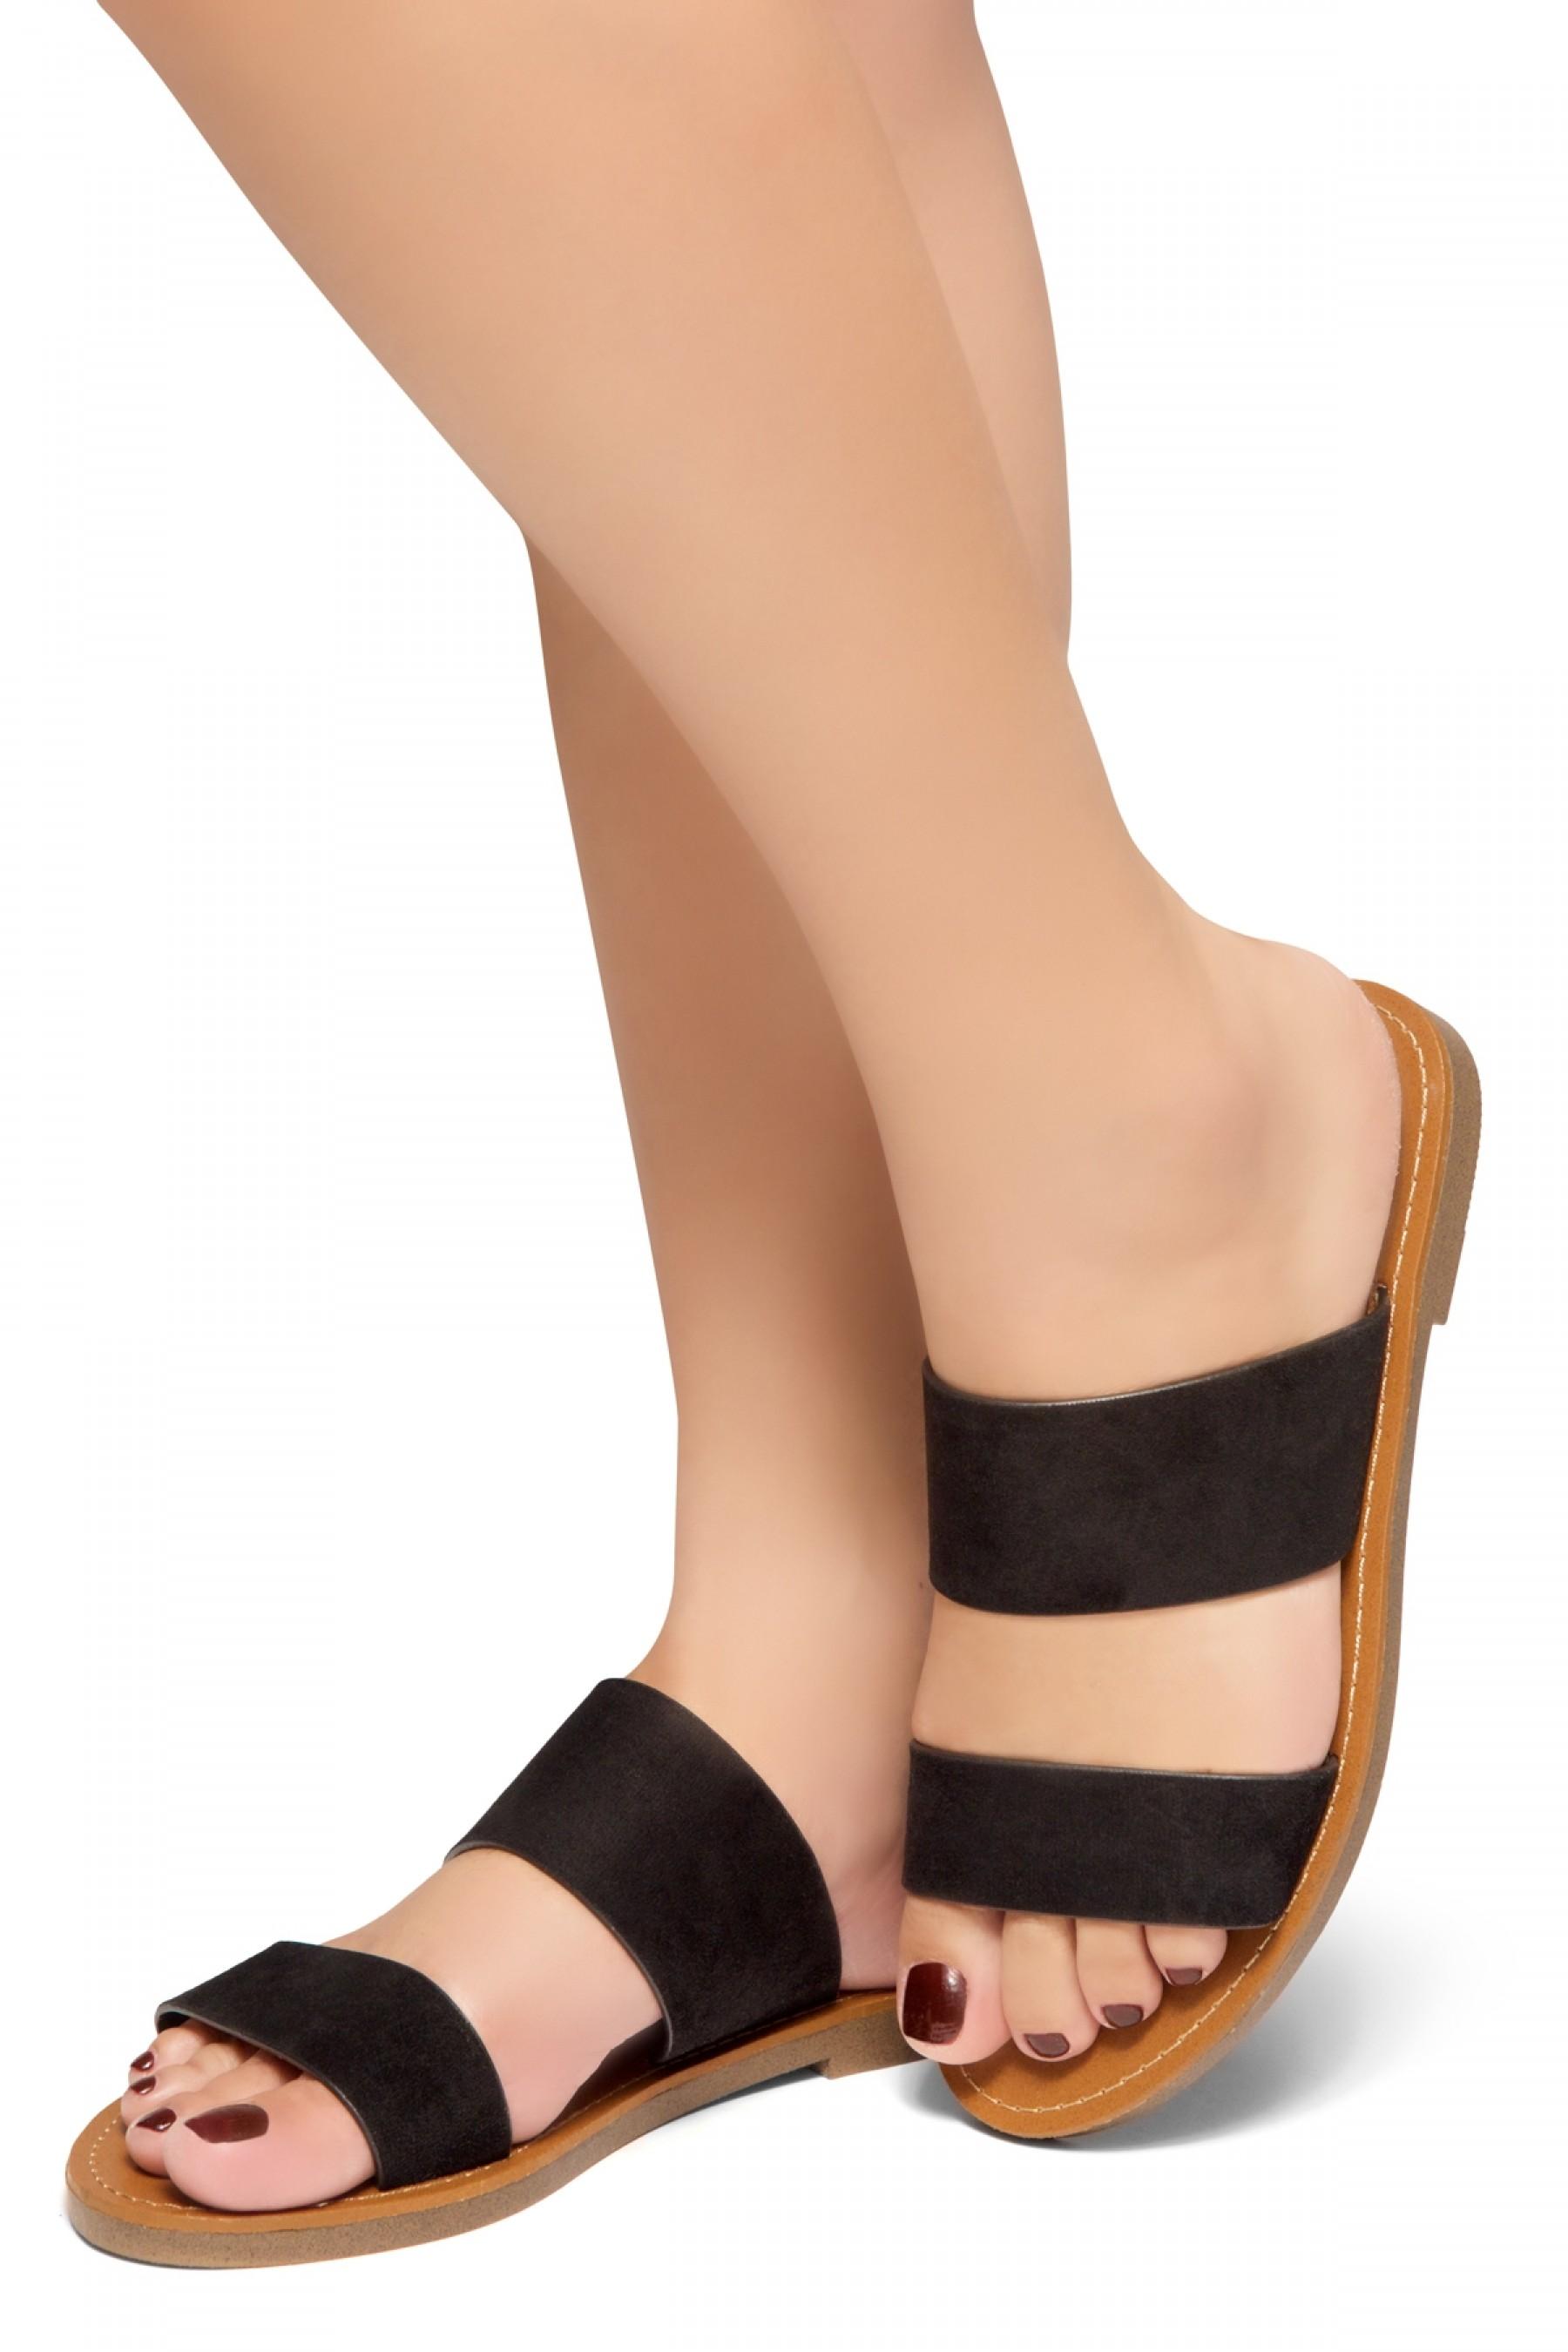 HerStyle Native- Open Toe Double Strap Vamp Open Back Easy Slide Sandals (Black)